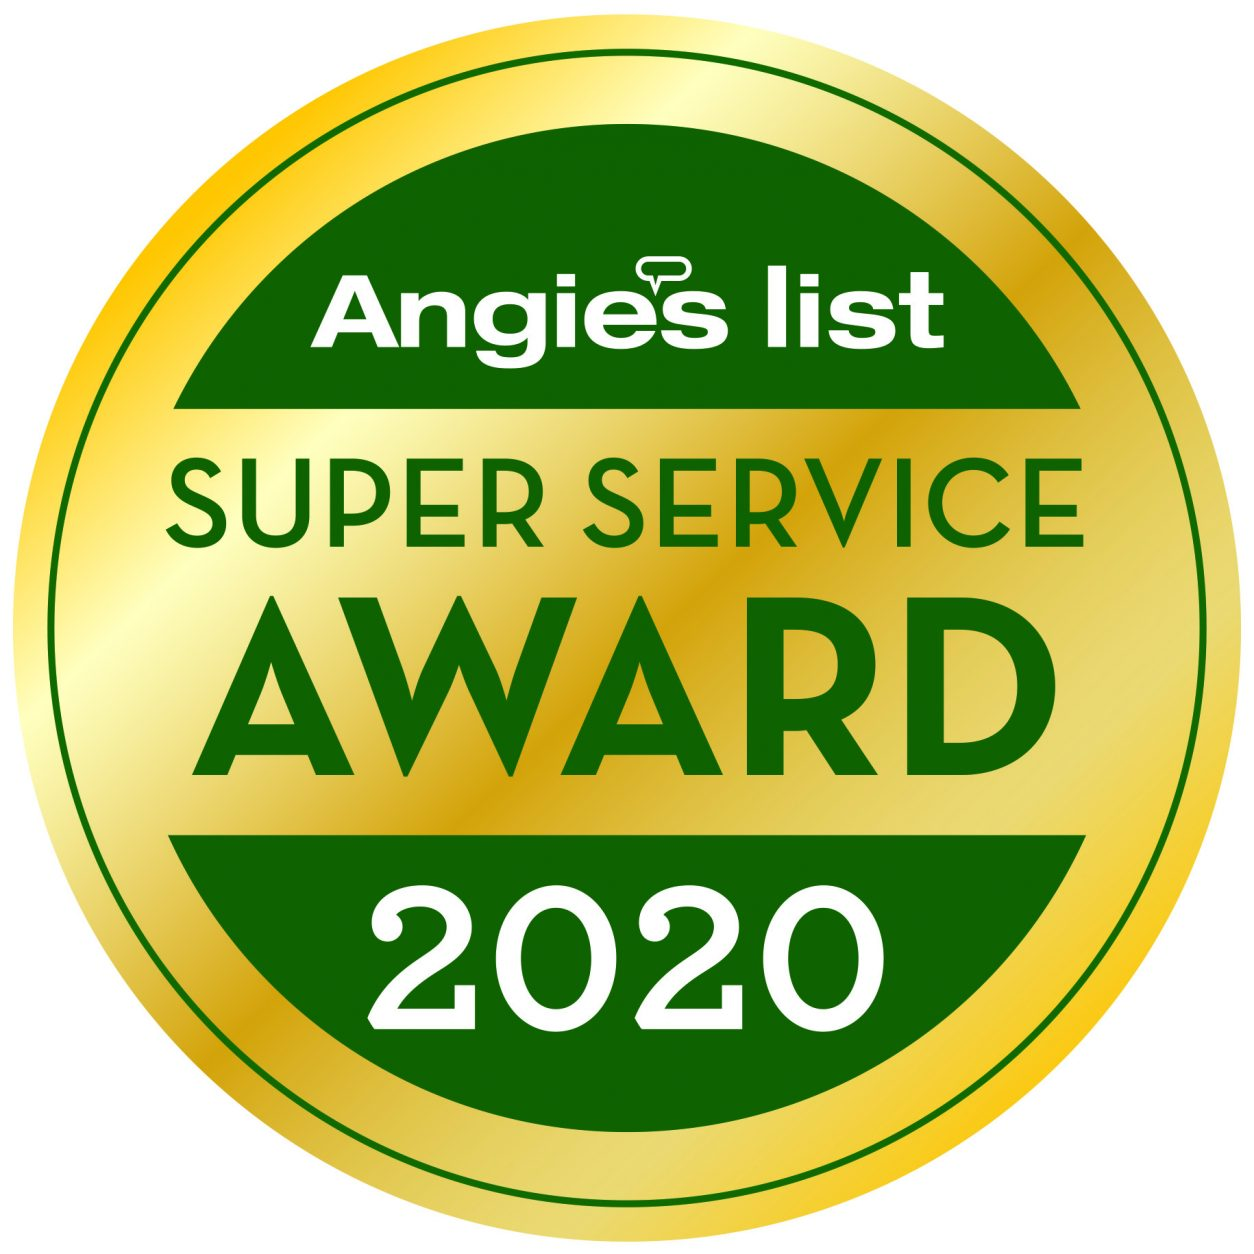 2020 Angie's Logo Amazing Flame Super Service Award